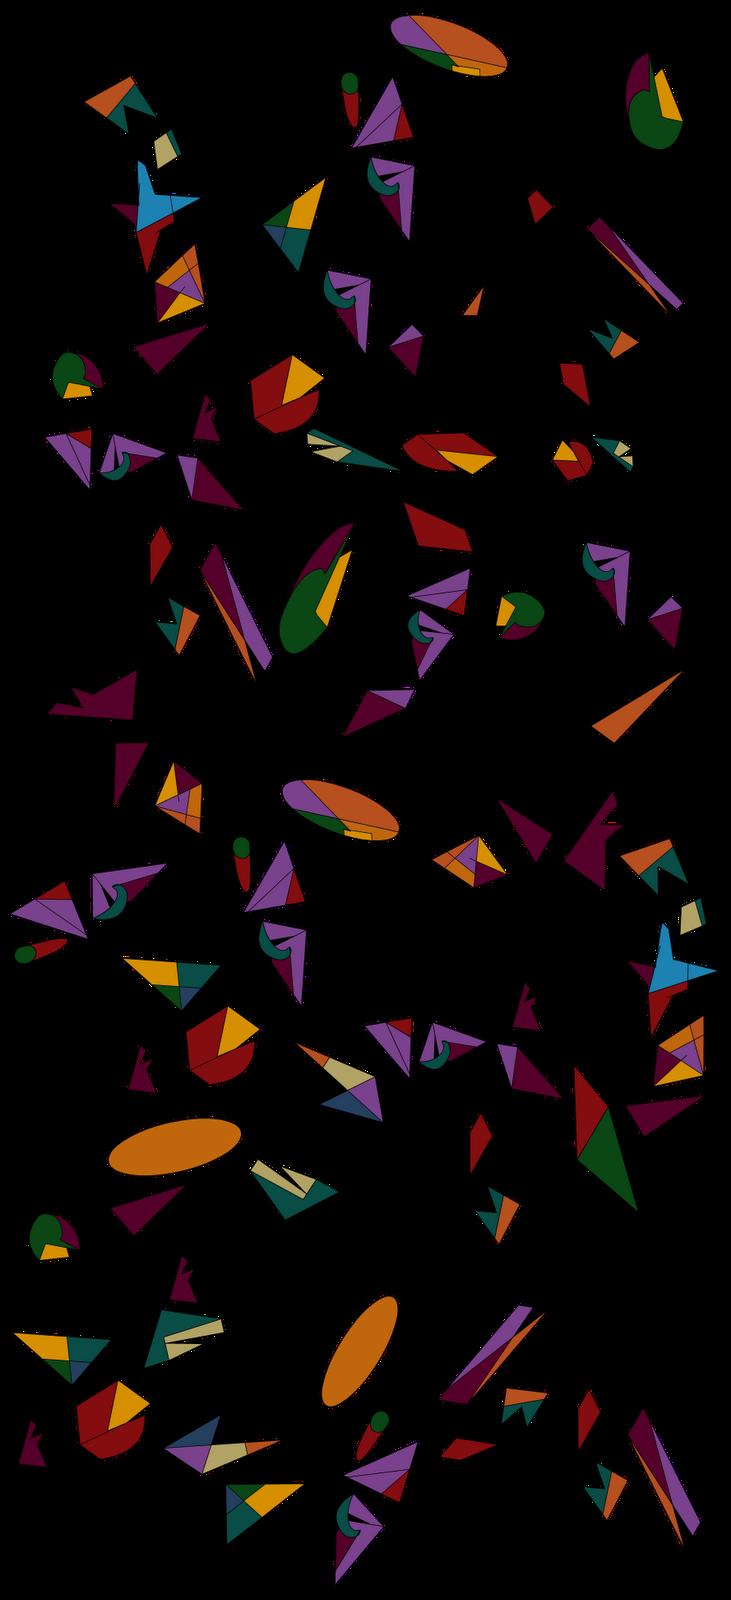 Confetti clipart sparse. A n s asethetics